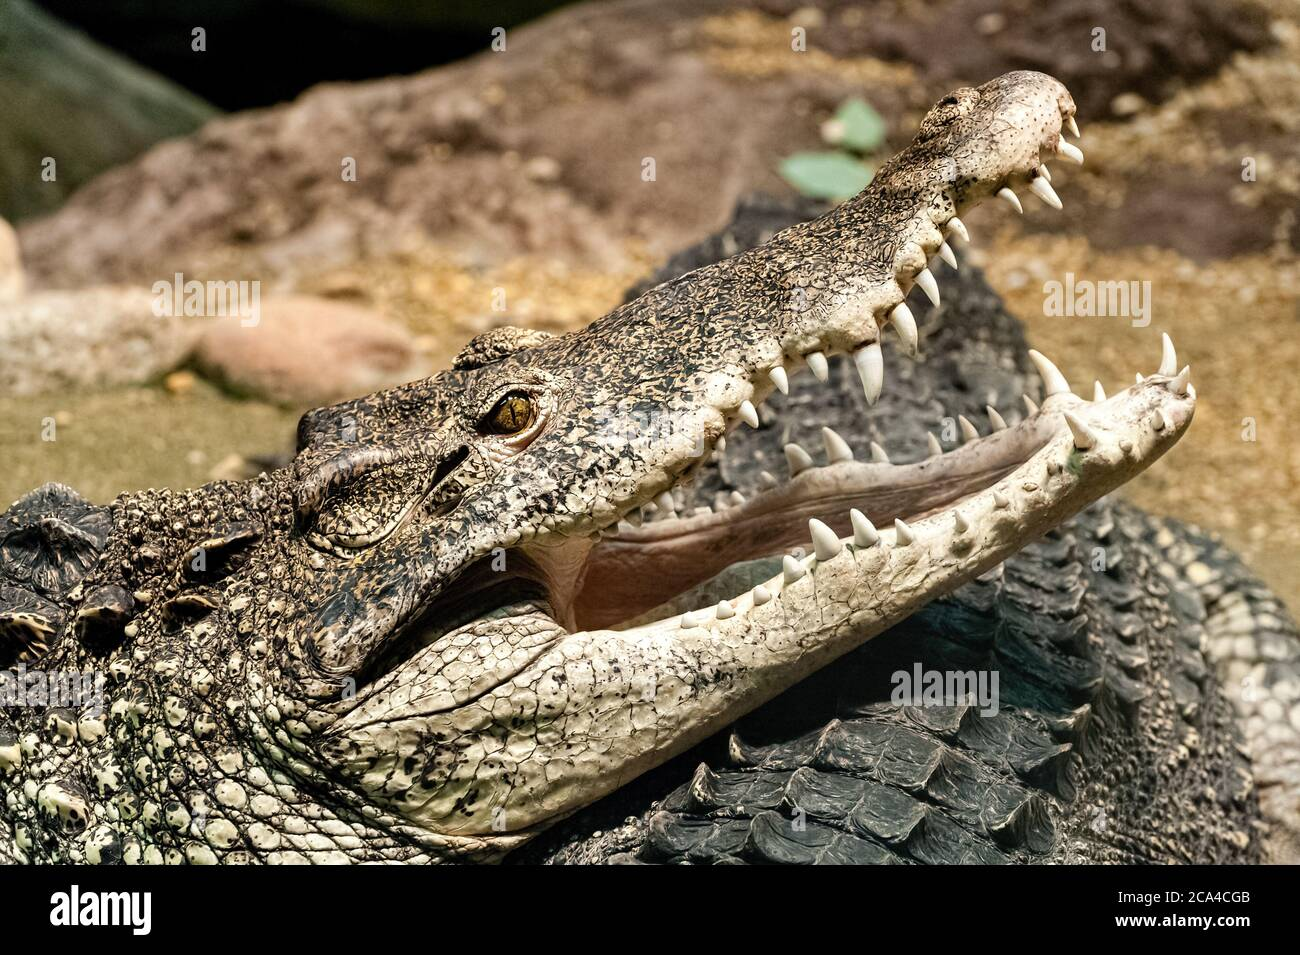 The Cuban crocodile (Crocodylus rhombifer) is a small species of crocodile found only in Cuba. Stock Photo